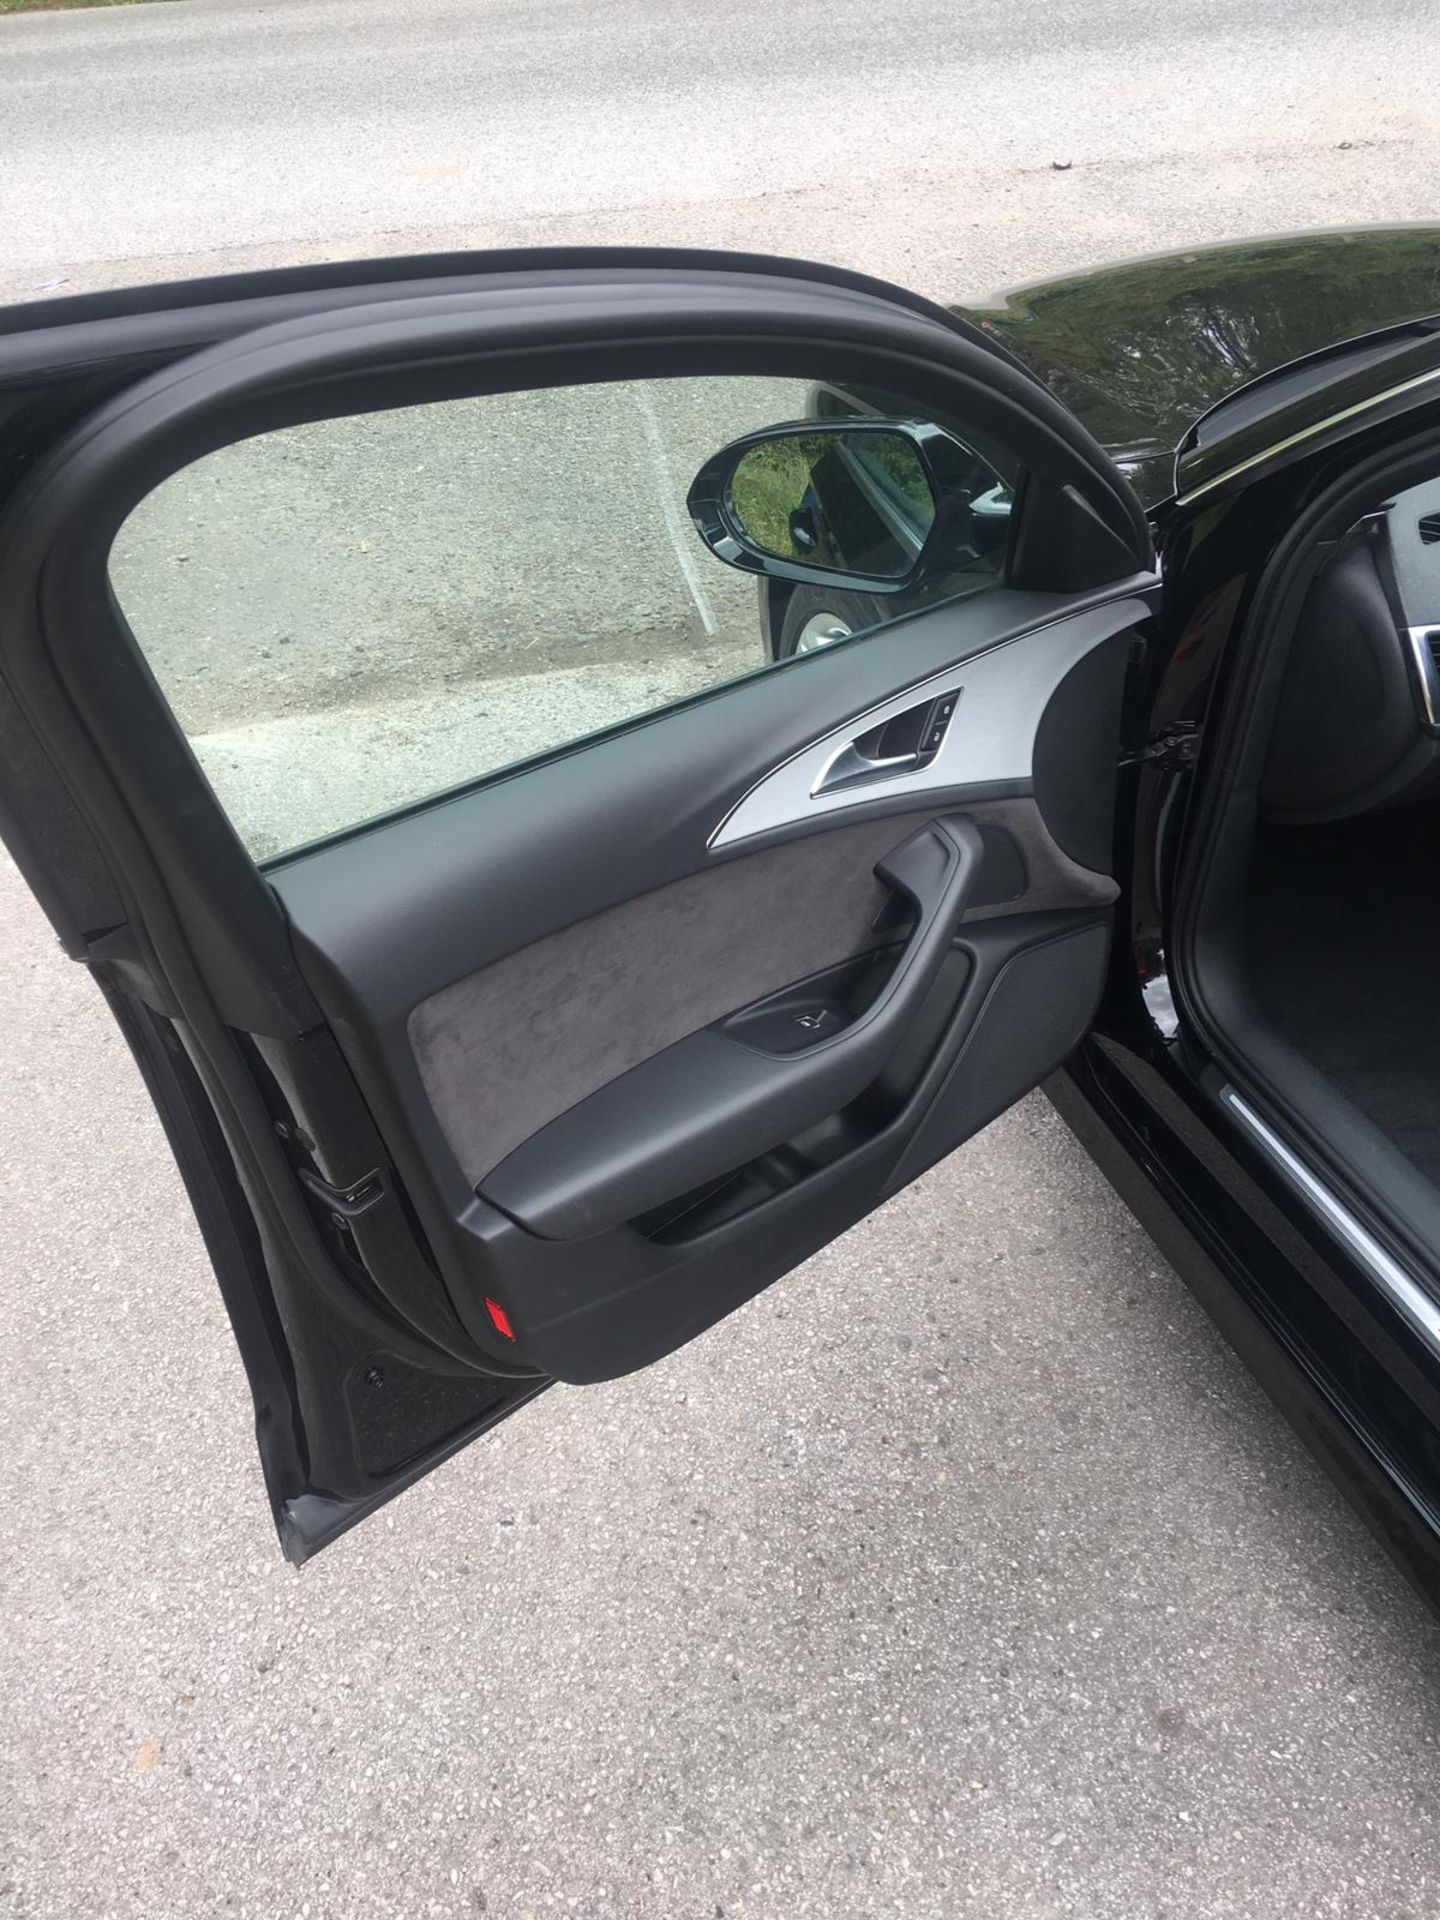 2018/18 REG AUDI A6 S LINE TDI ULTRA SEMI-AUTO 2.0 DIESEL ESTATE, SHOWING 1 FORMER KEEPER *NO VAT* - Image 14 of 33